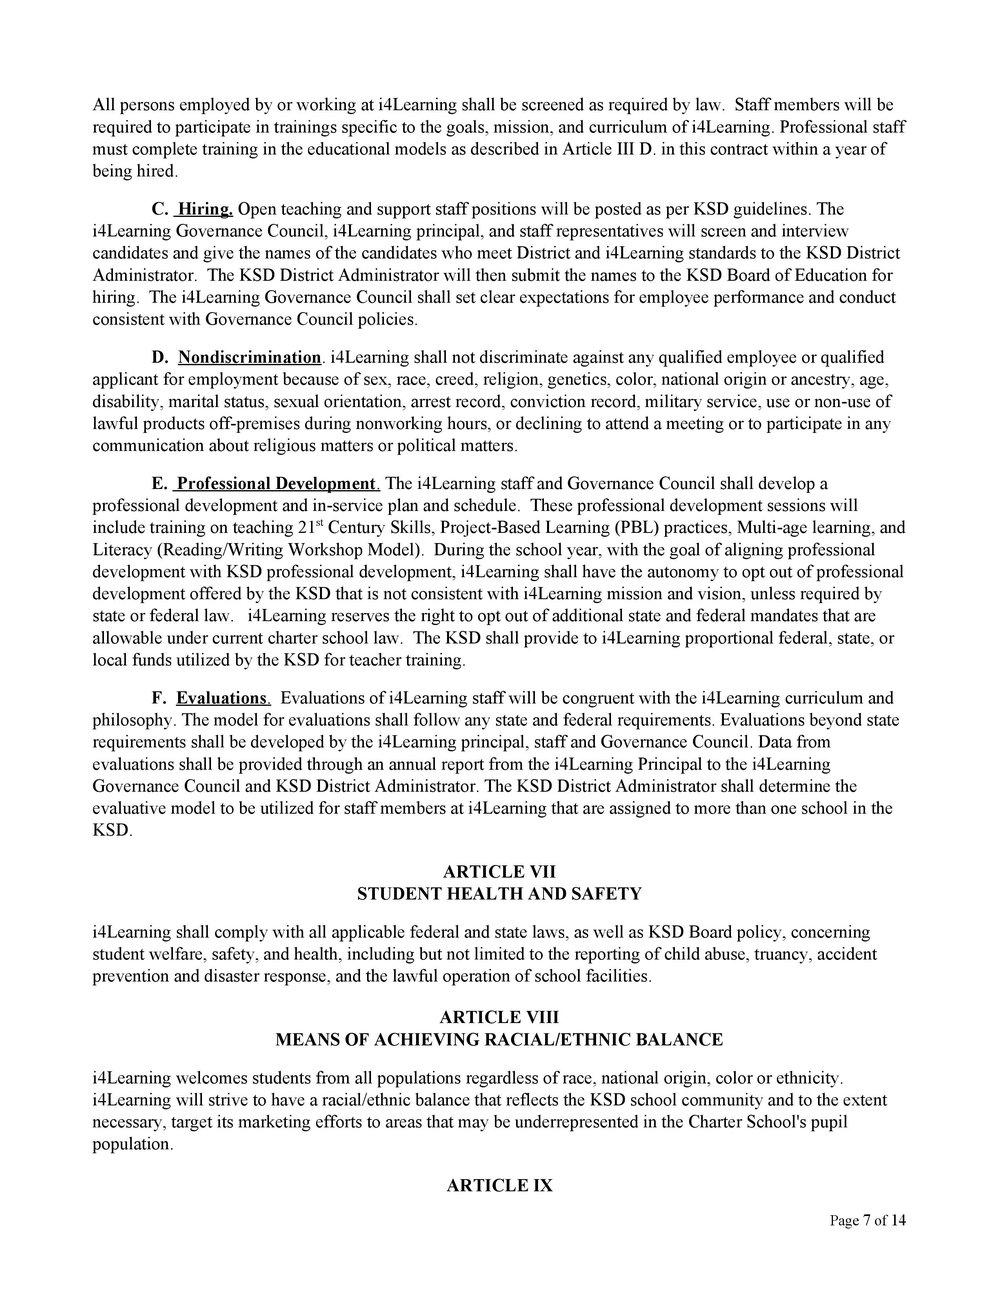 Contract pg 7.jpg